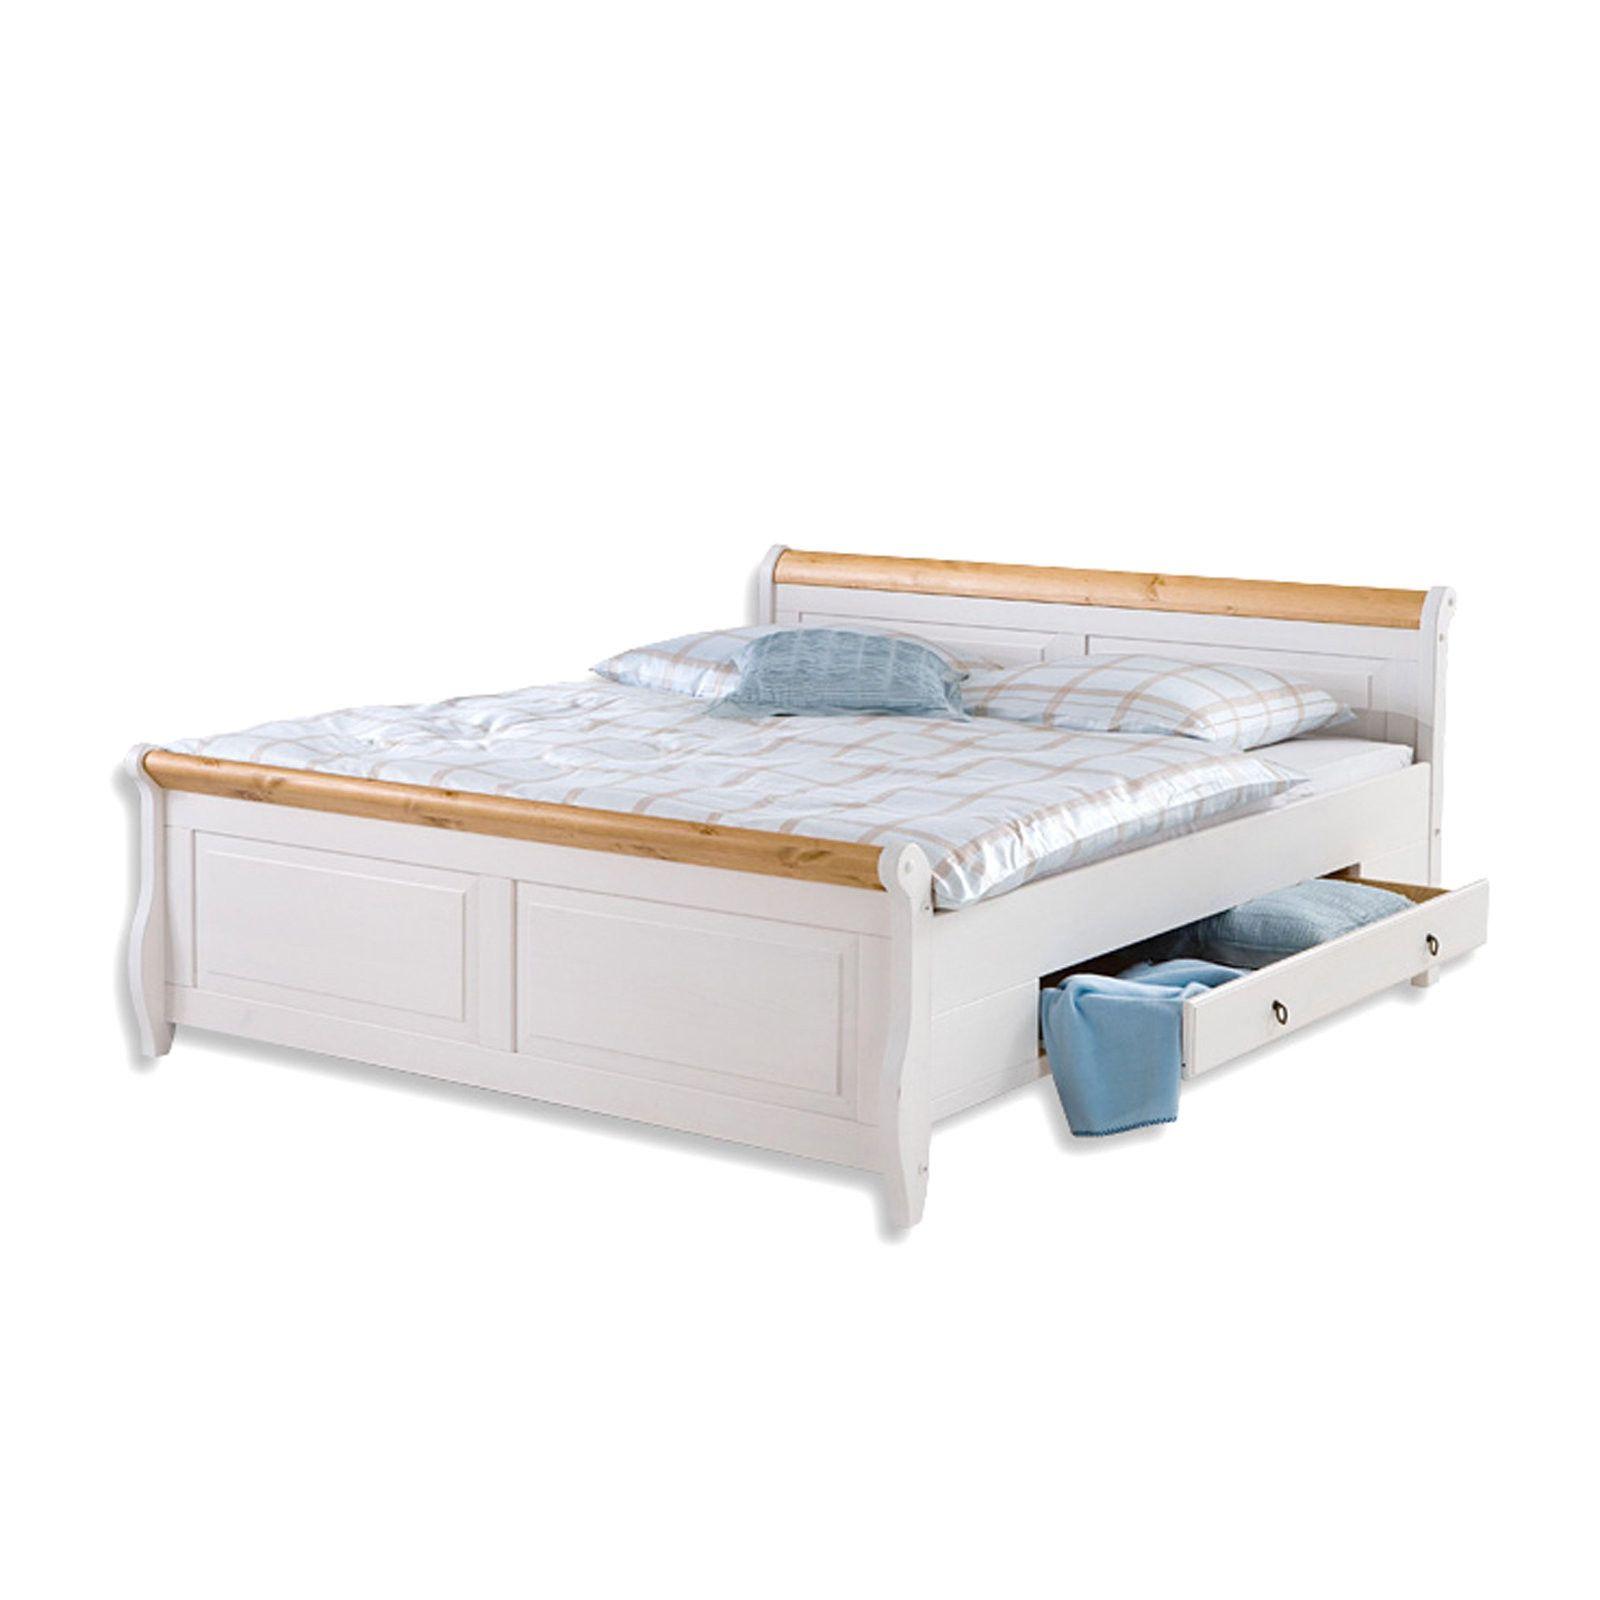 50 Unique Bett Kiefer 140x200 La Photographie In 2020 Ikea Malm Simple Bedroom Bed